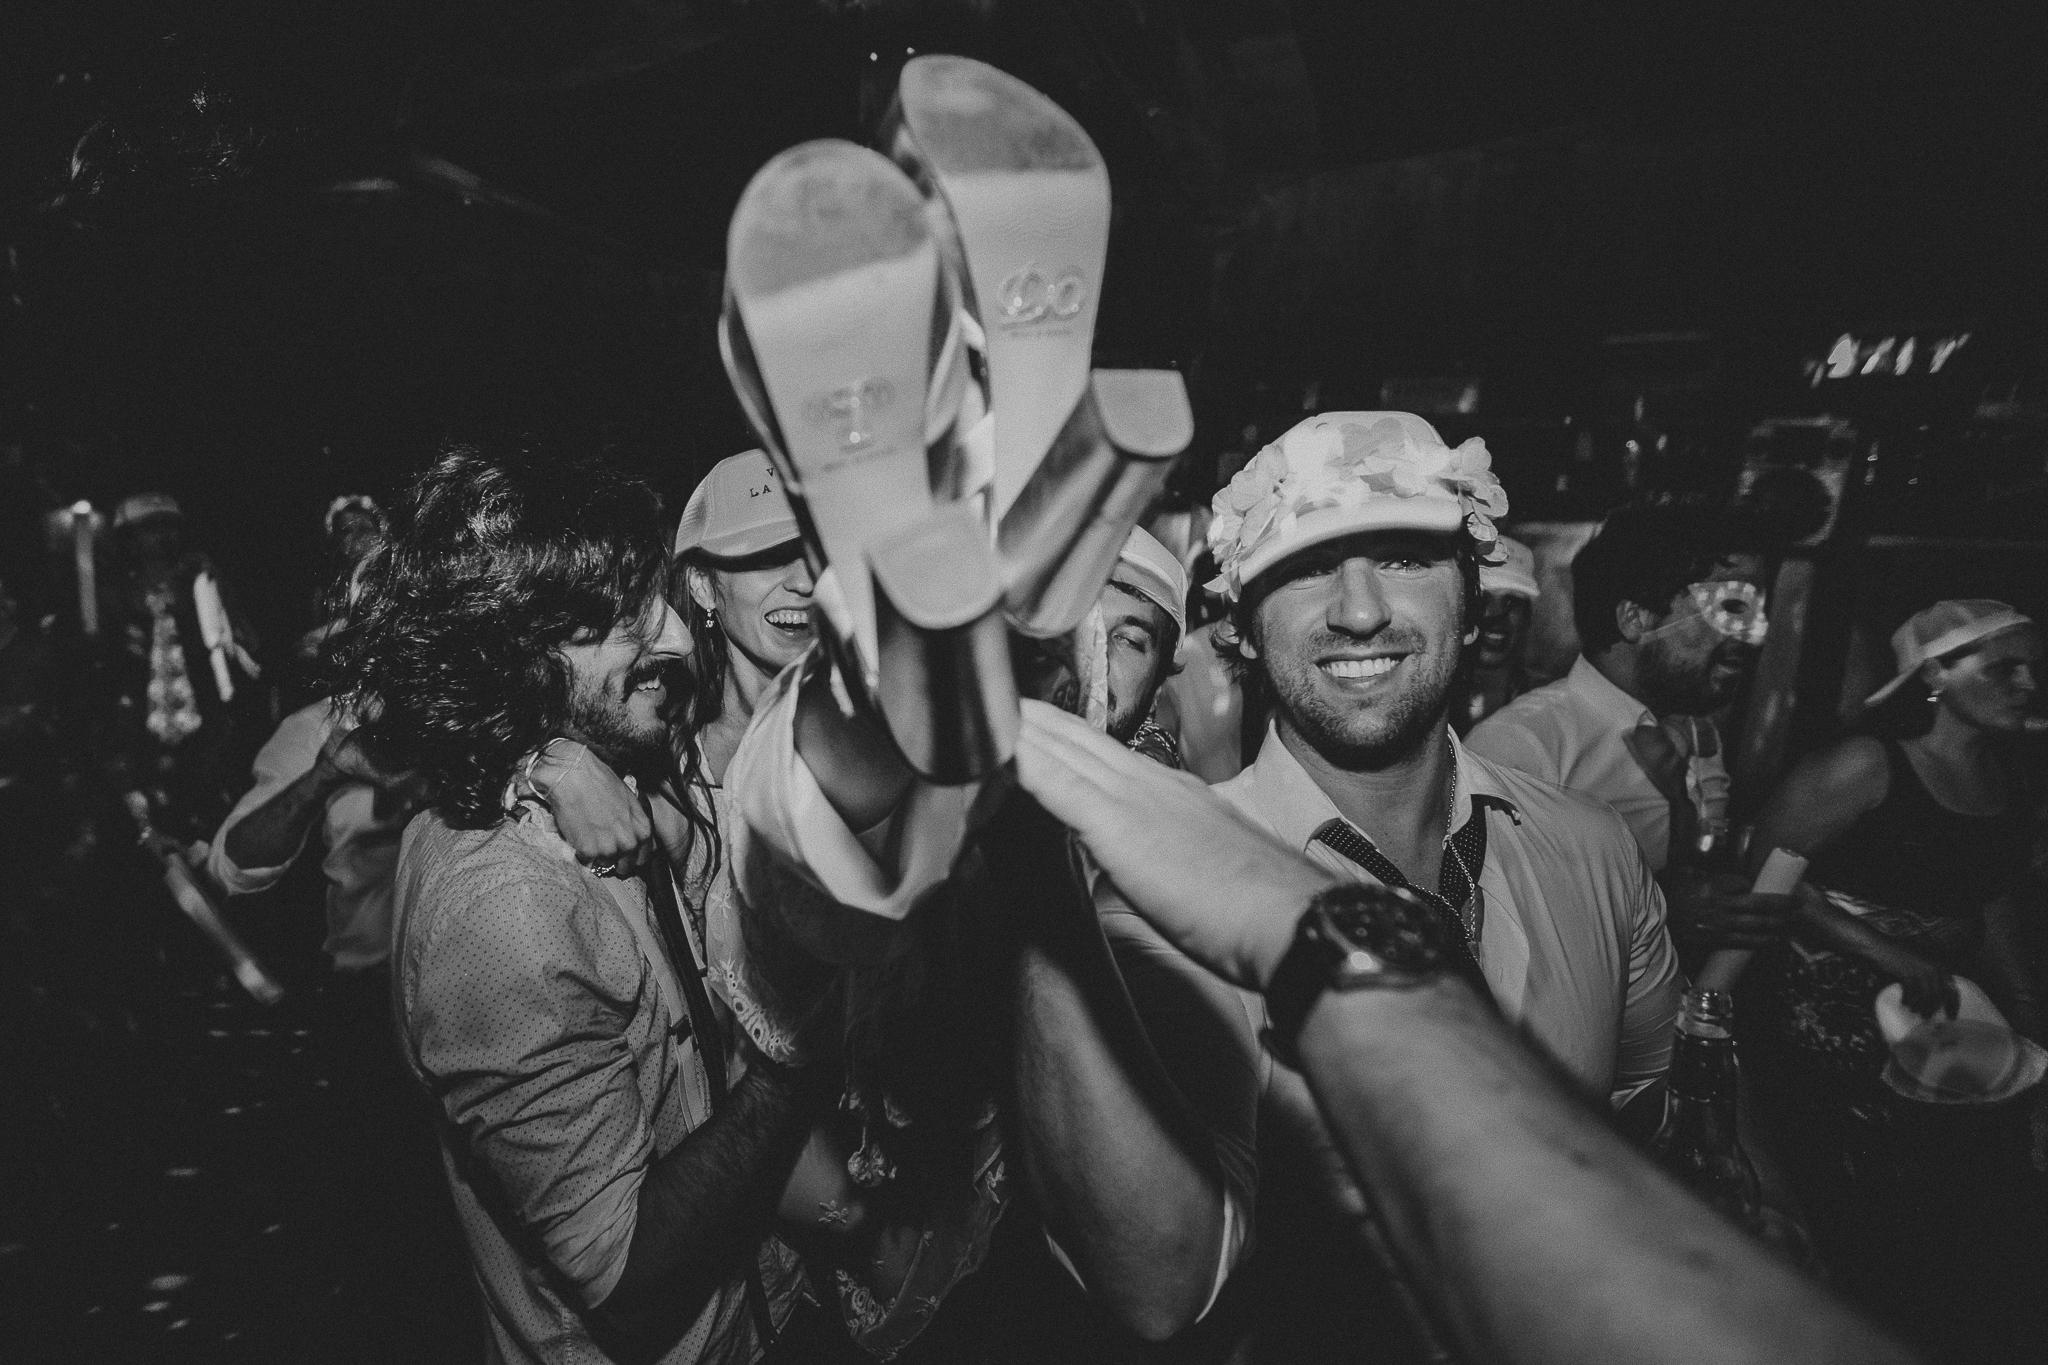 fotografos-de-boda-uruguay